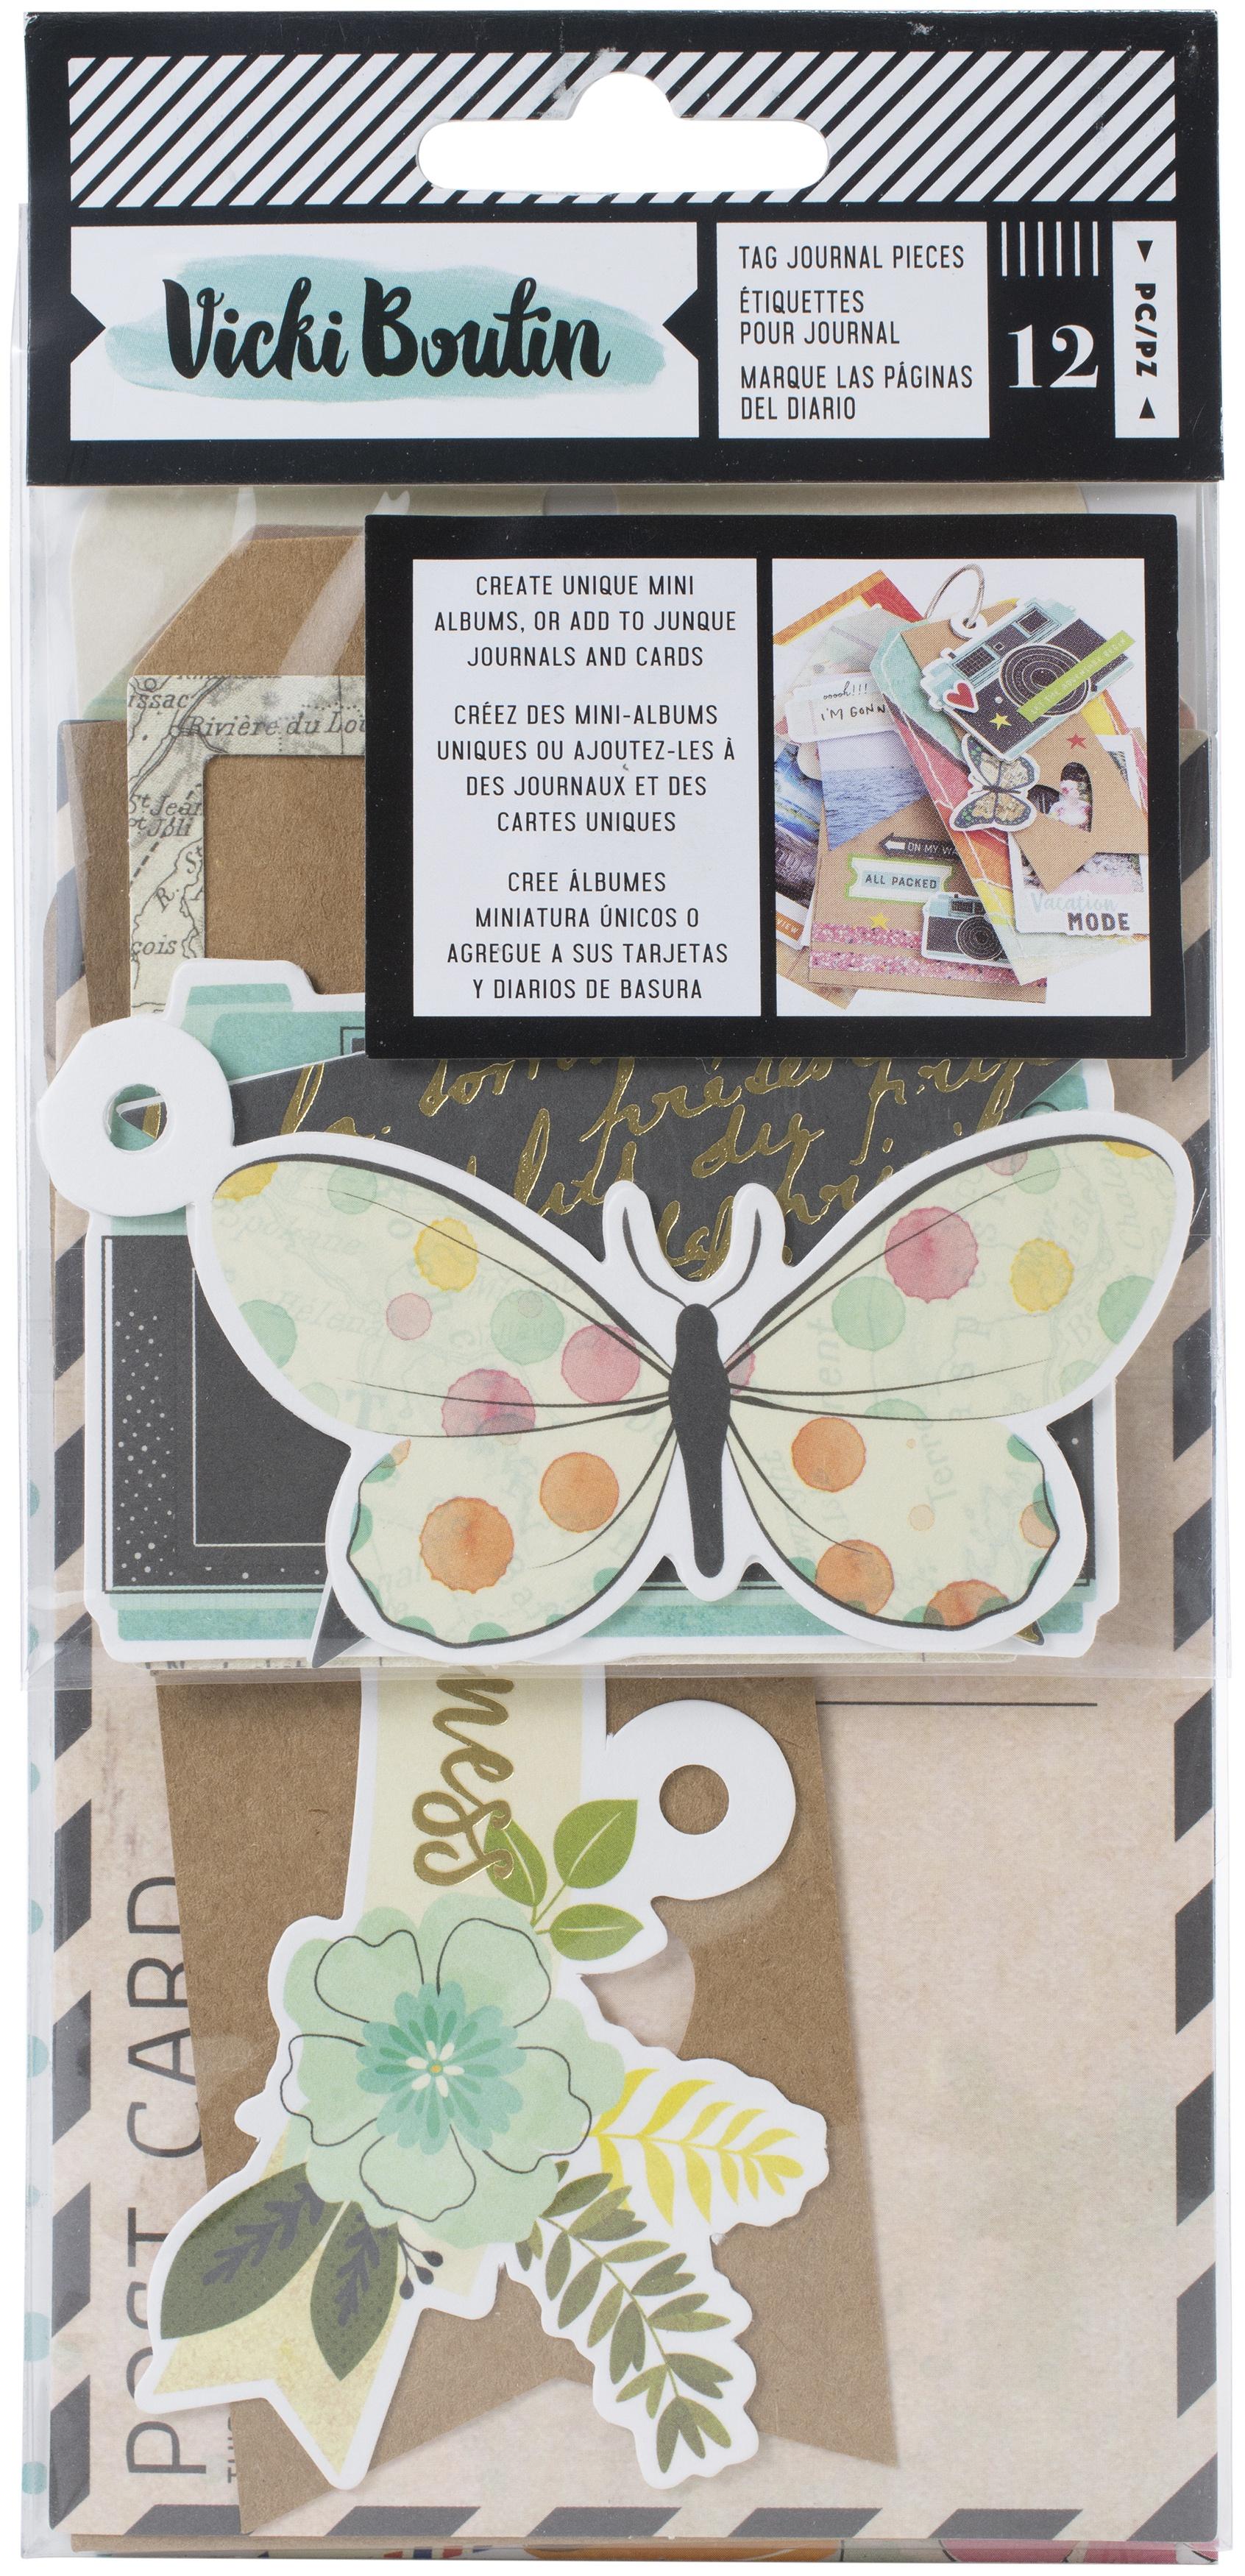 ^Vicki Boutin - Let's Wander - Tag Journal Pieces, 12/Pkg